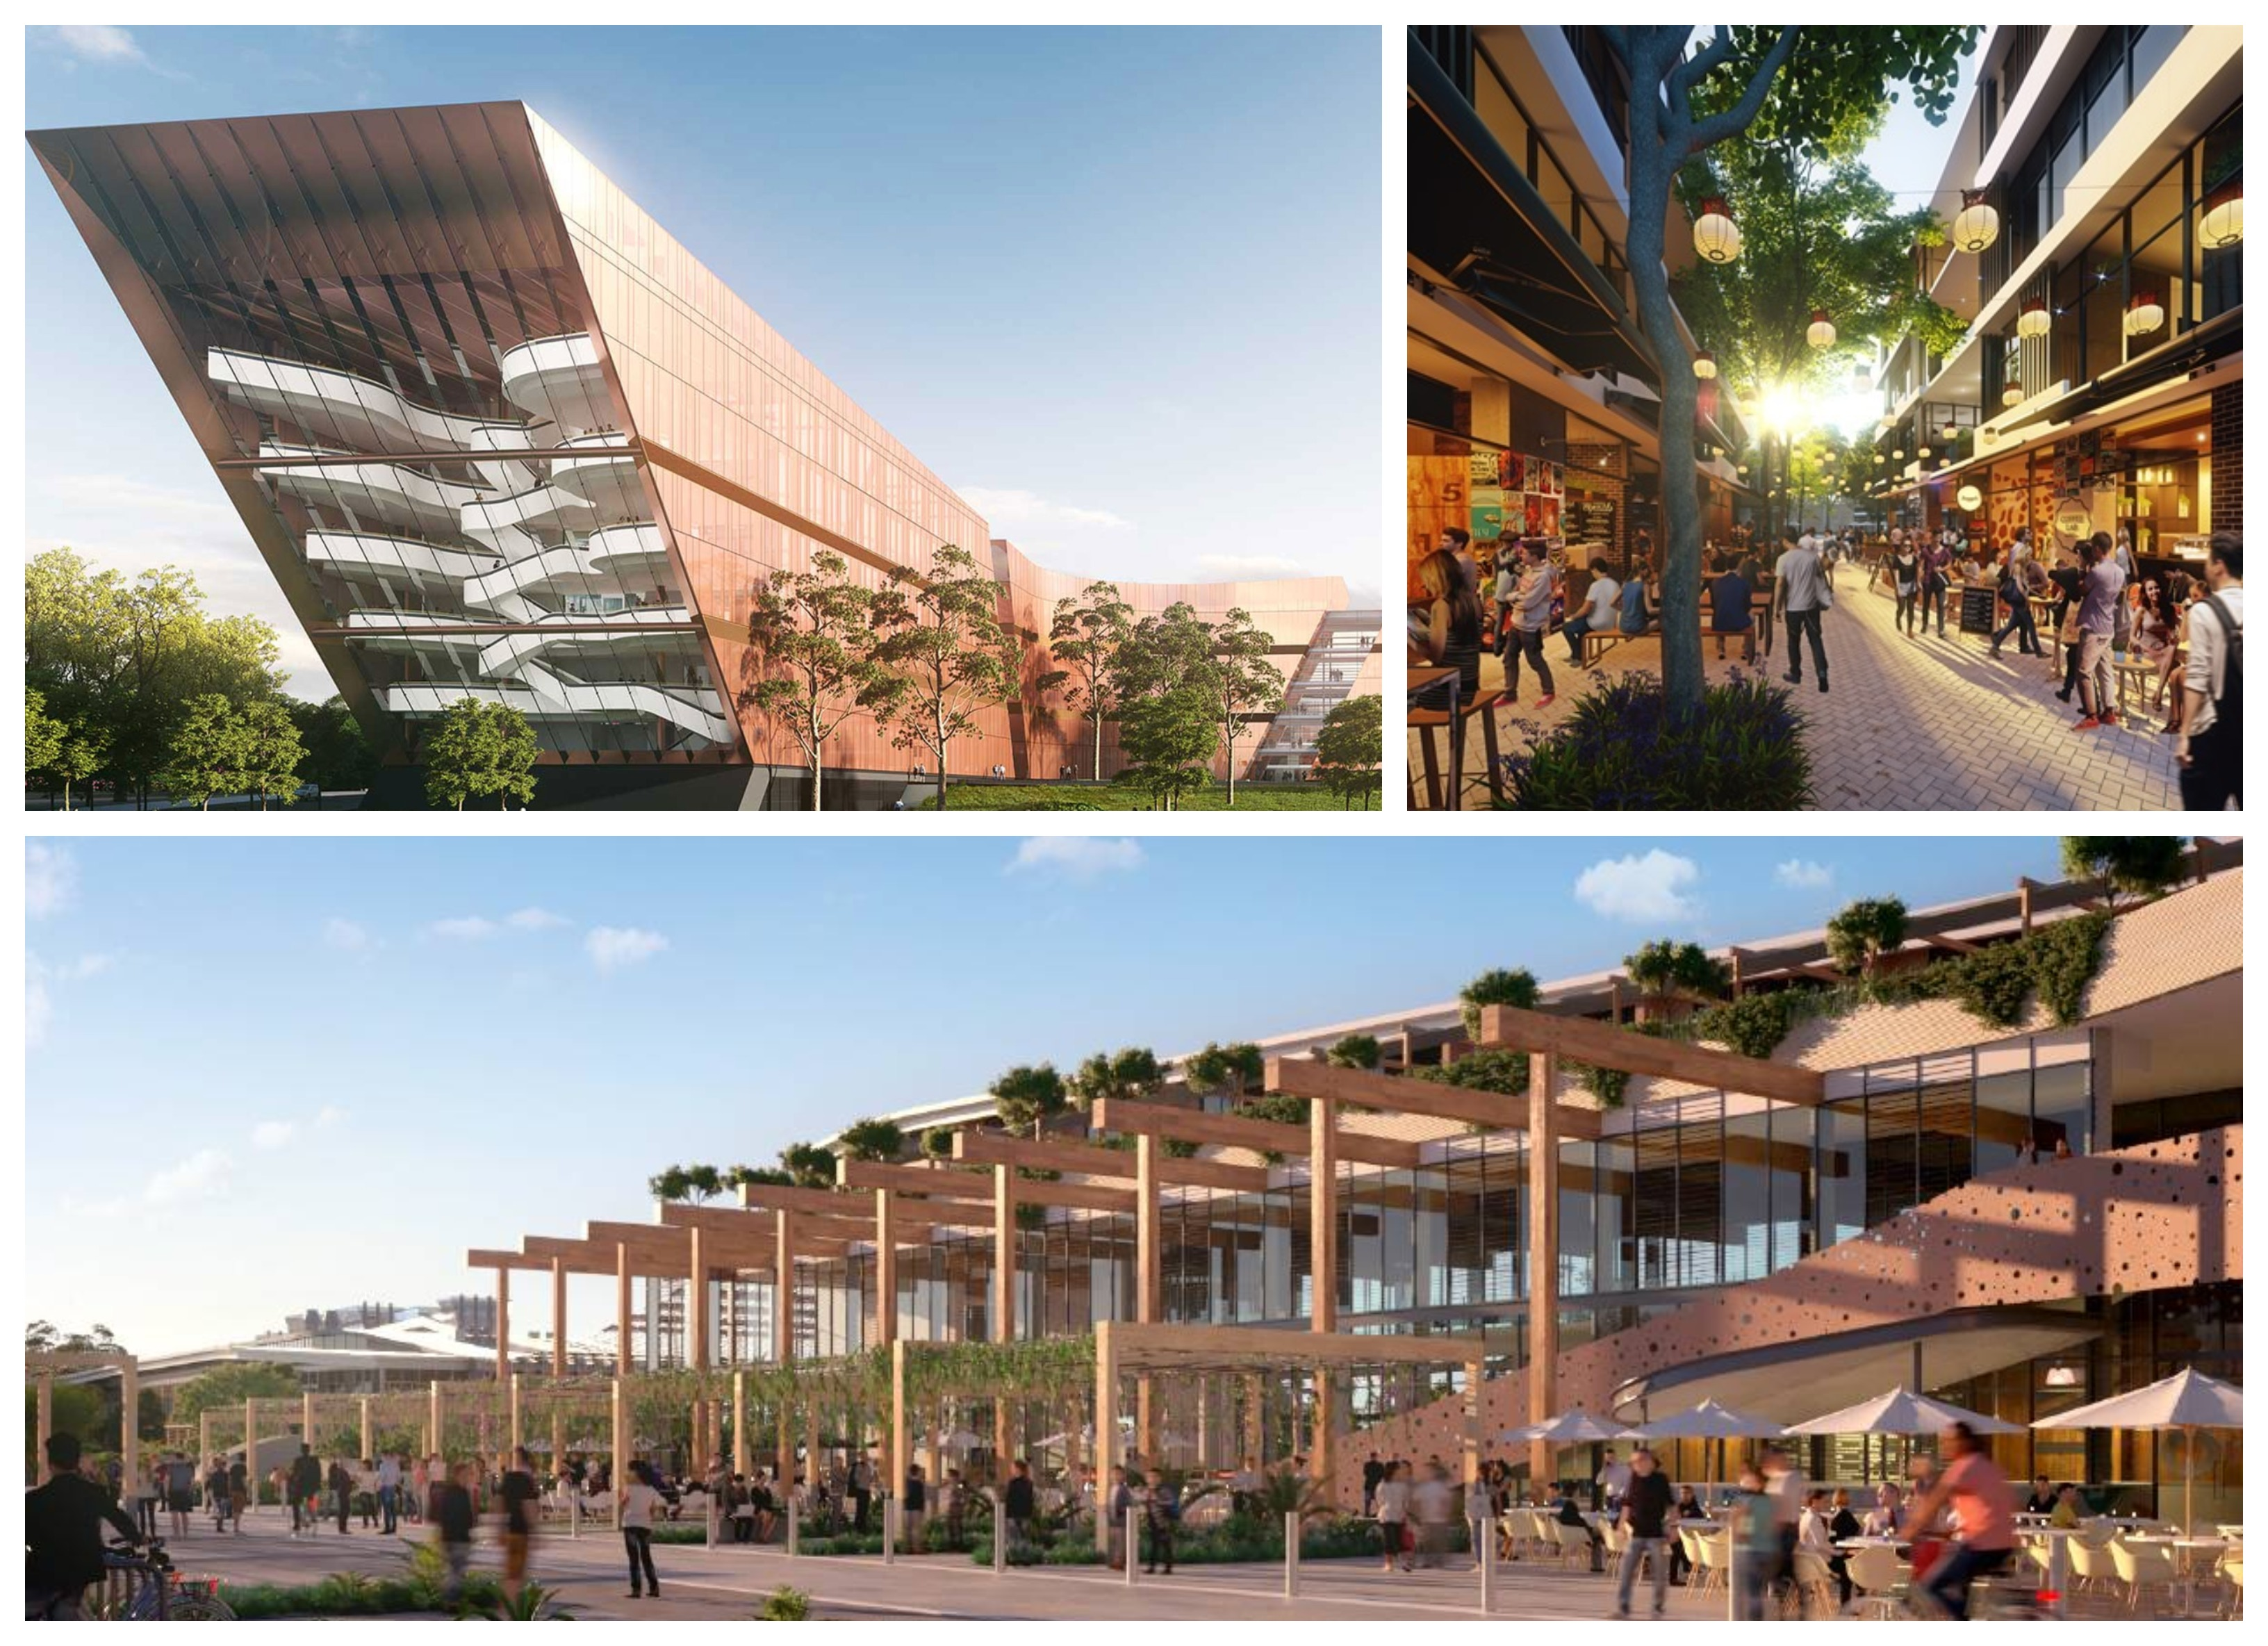 Plans for the $5 billion Sydney Science Park in Luddenham, roughly 42 kilometres west of Sydney CBD.